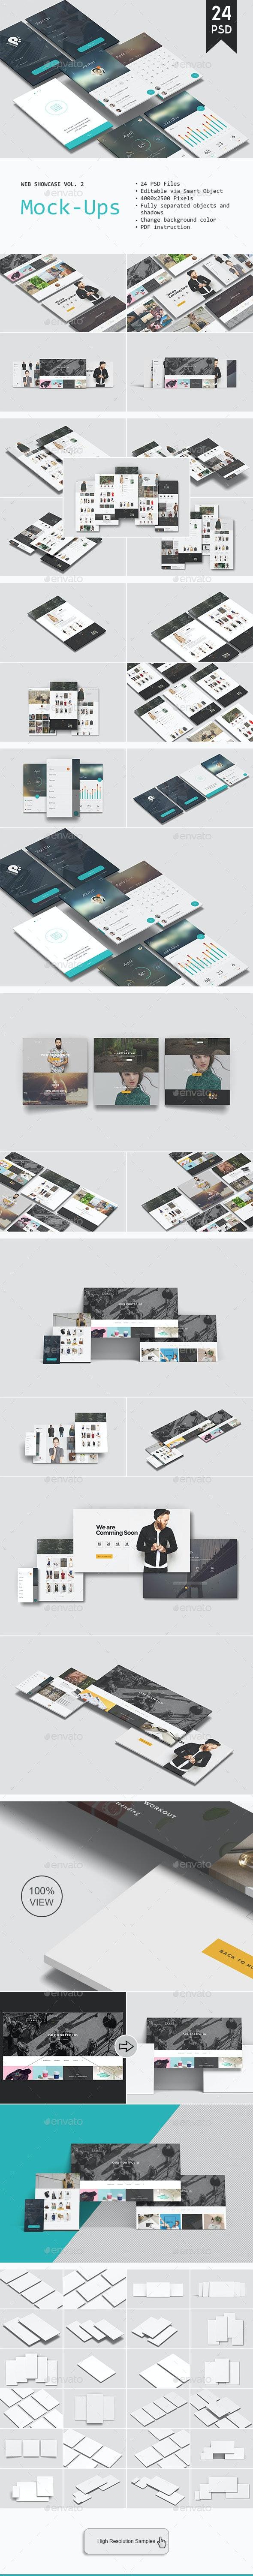 Web Showcase Mockup Vol. 2 - Website Displays